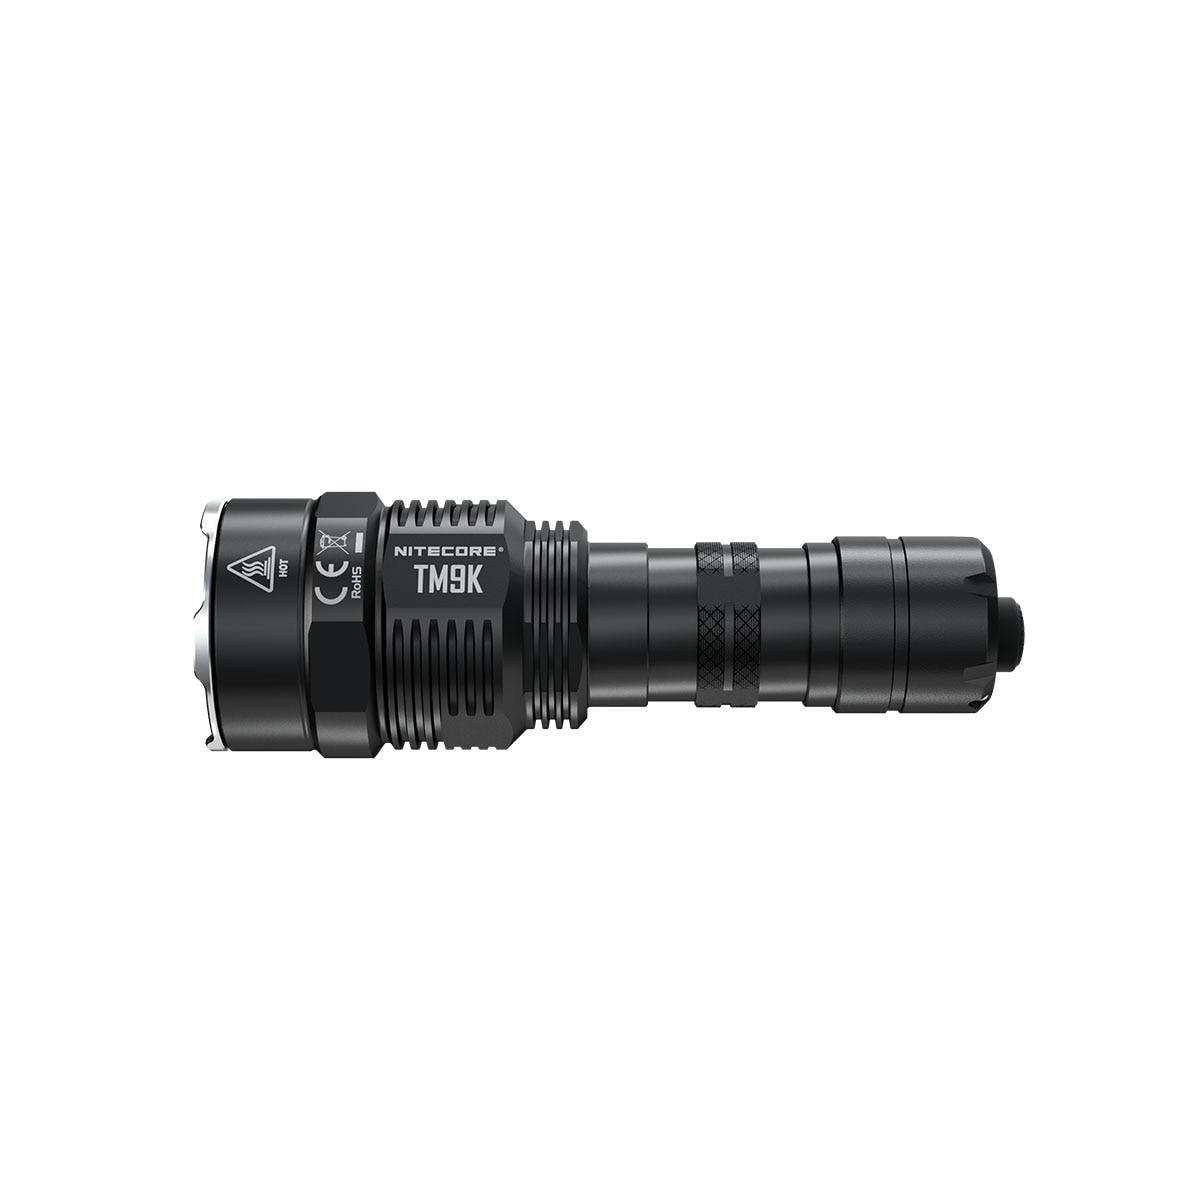 Image 4 - NITECORE TM9K Tactical Flashlight 9 XP L HD V6 LEDs max 9500 Lumen throw 268M built in 21700 5000mAh battery USB Charging TorchFlashlights & Torches   -